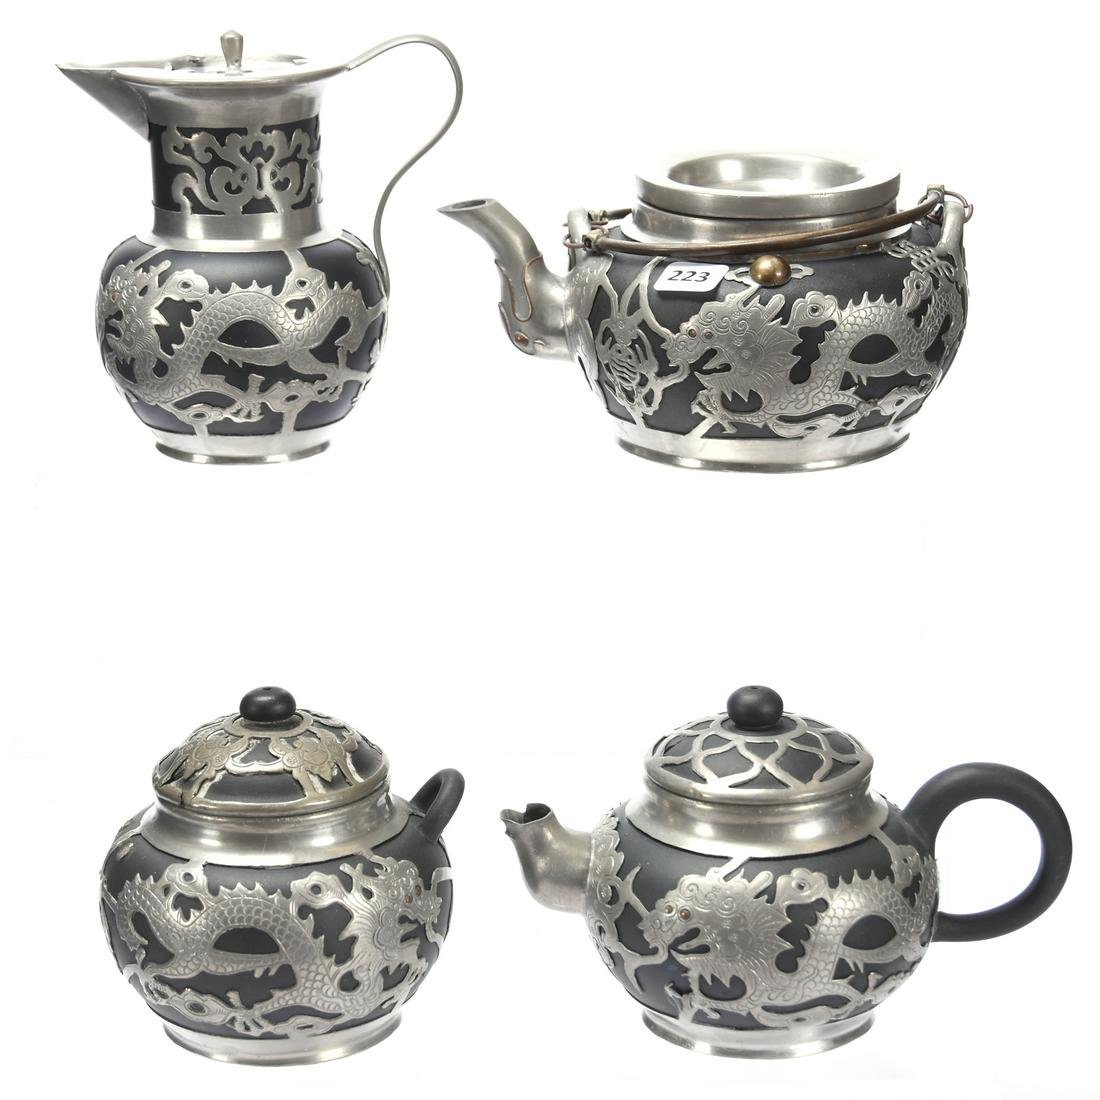 (4) Piece Set Ebony Oriental Set, Silver Overlay